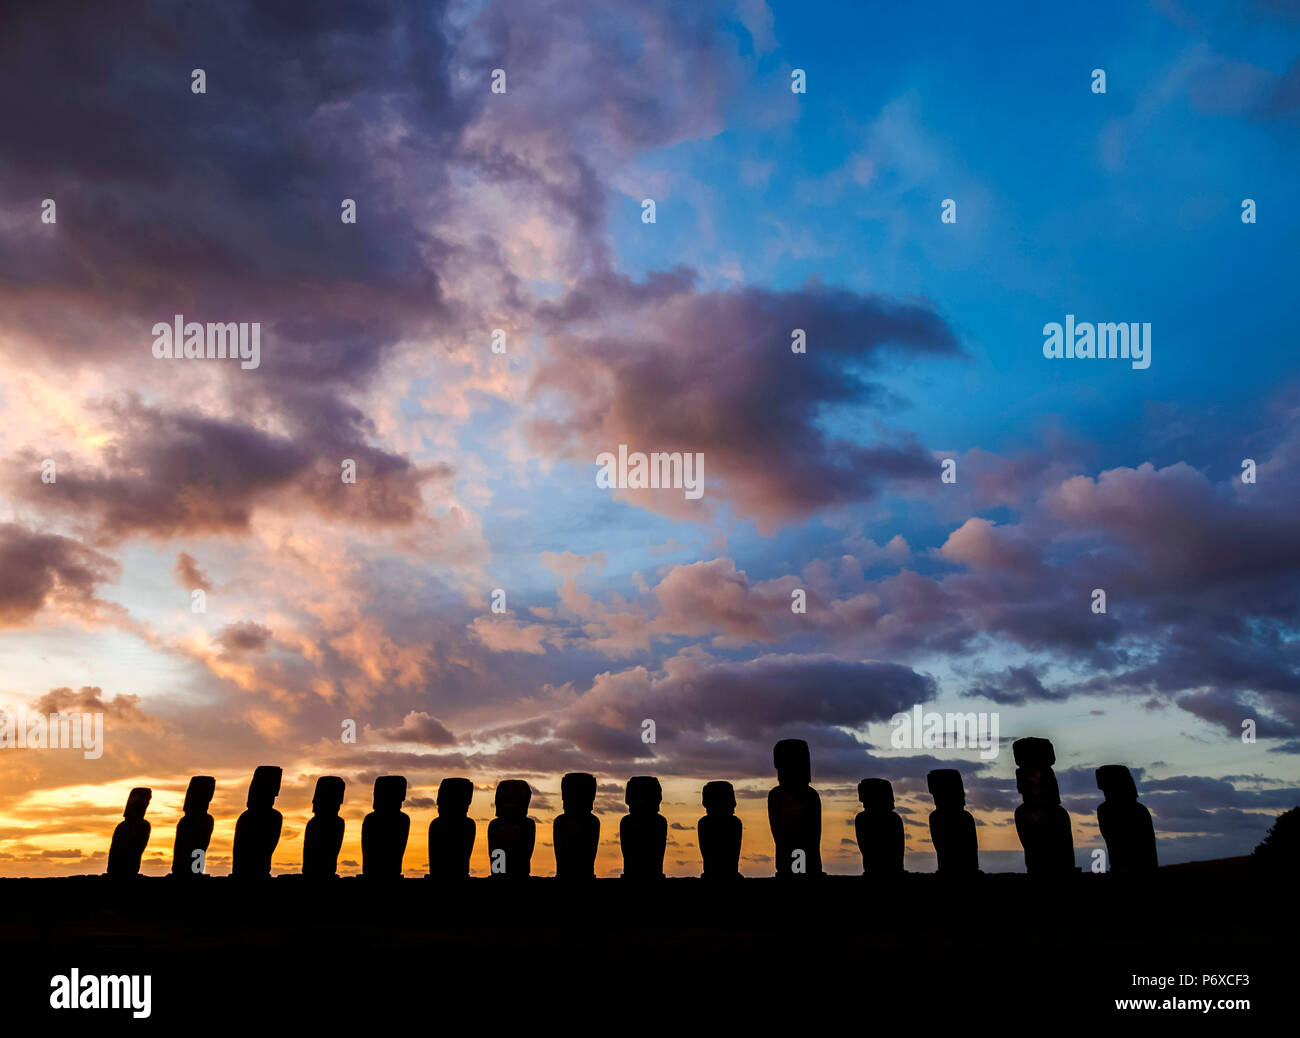 Moais in Ahu Tongariki at sunrise, Rapa Nui National Park, Easter Island, Chile - Stock Image